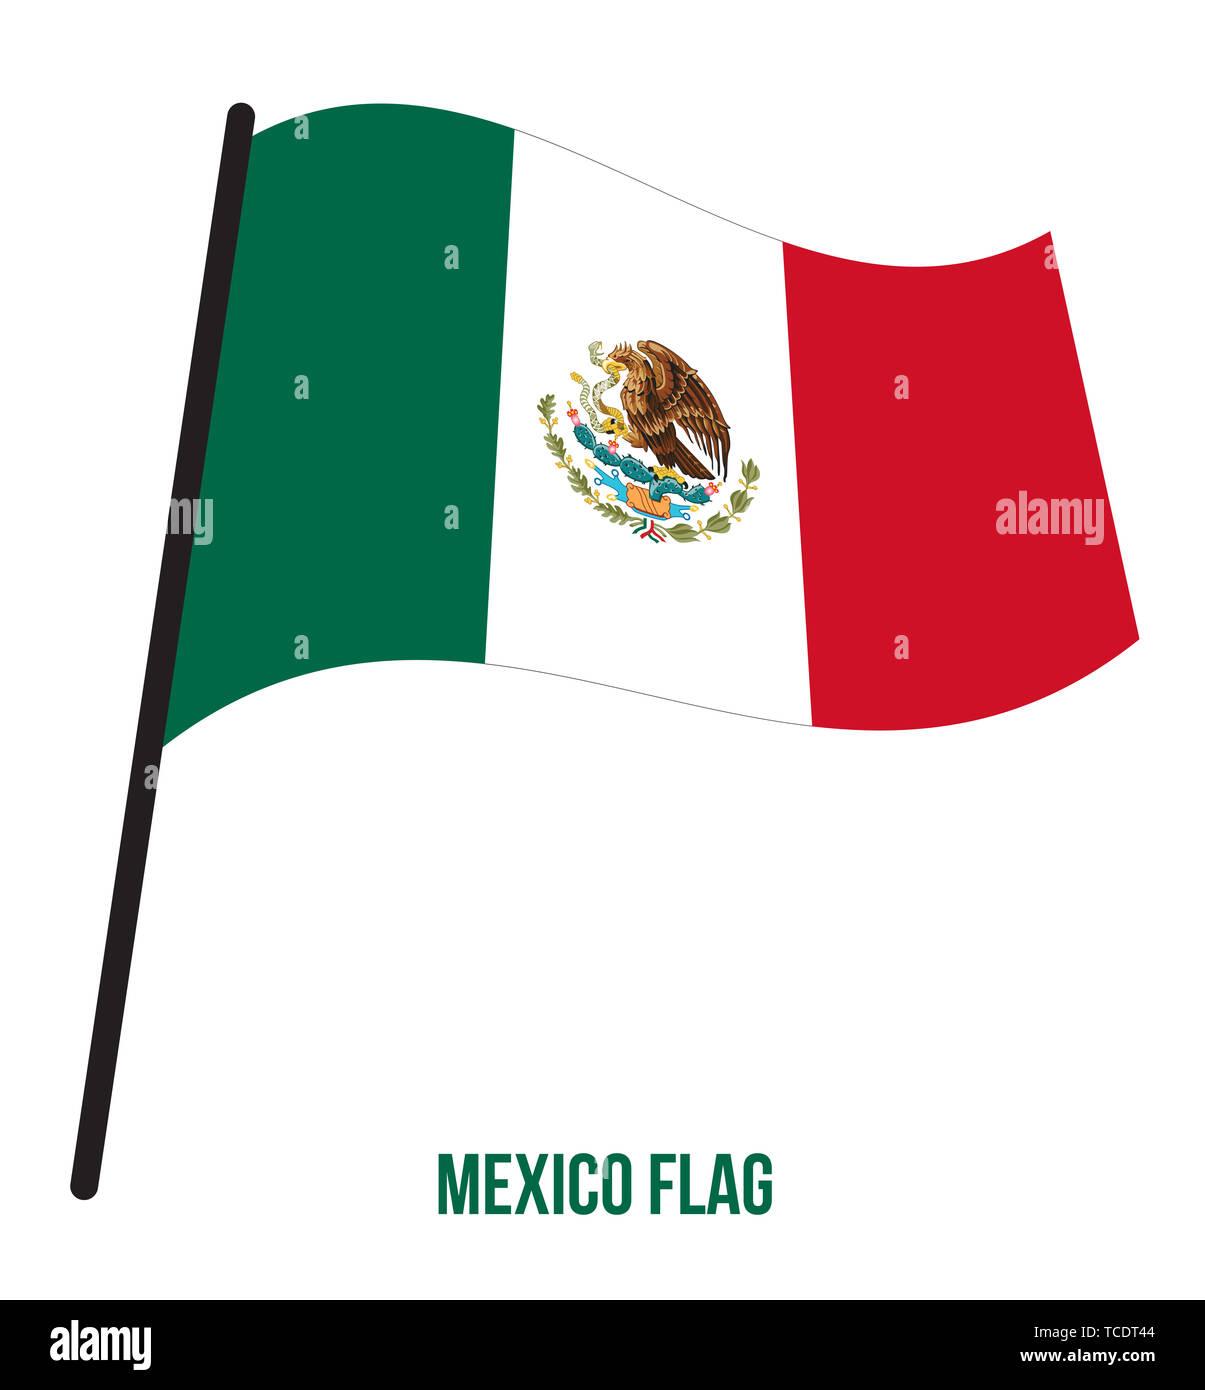 Mexico Flag Waving Vector Illustration on White Background. Mexico National Flag. Stock Photo